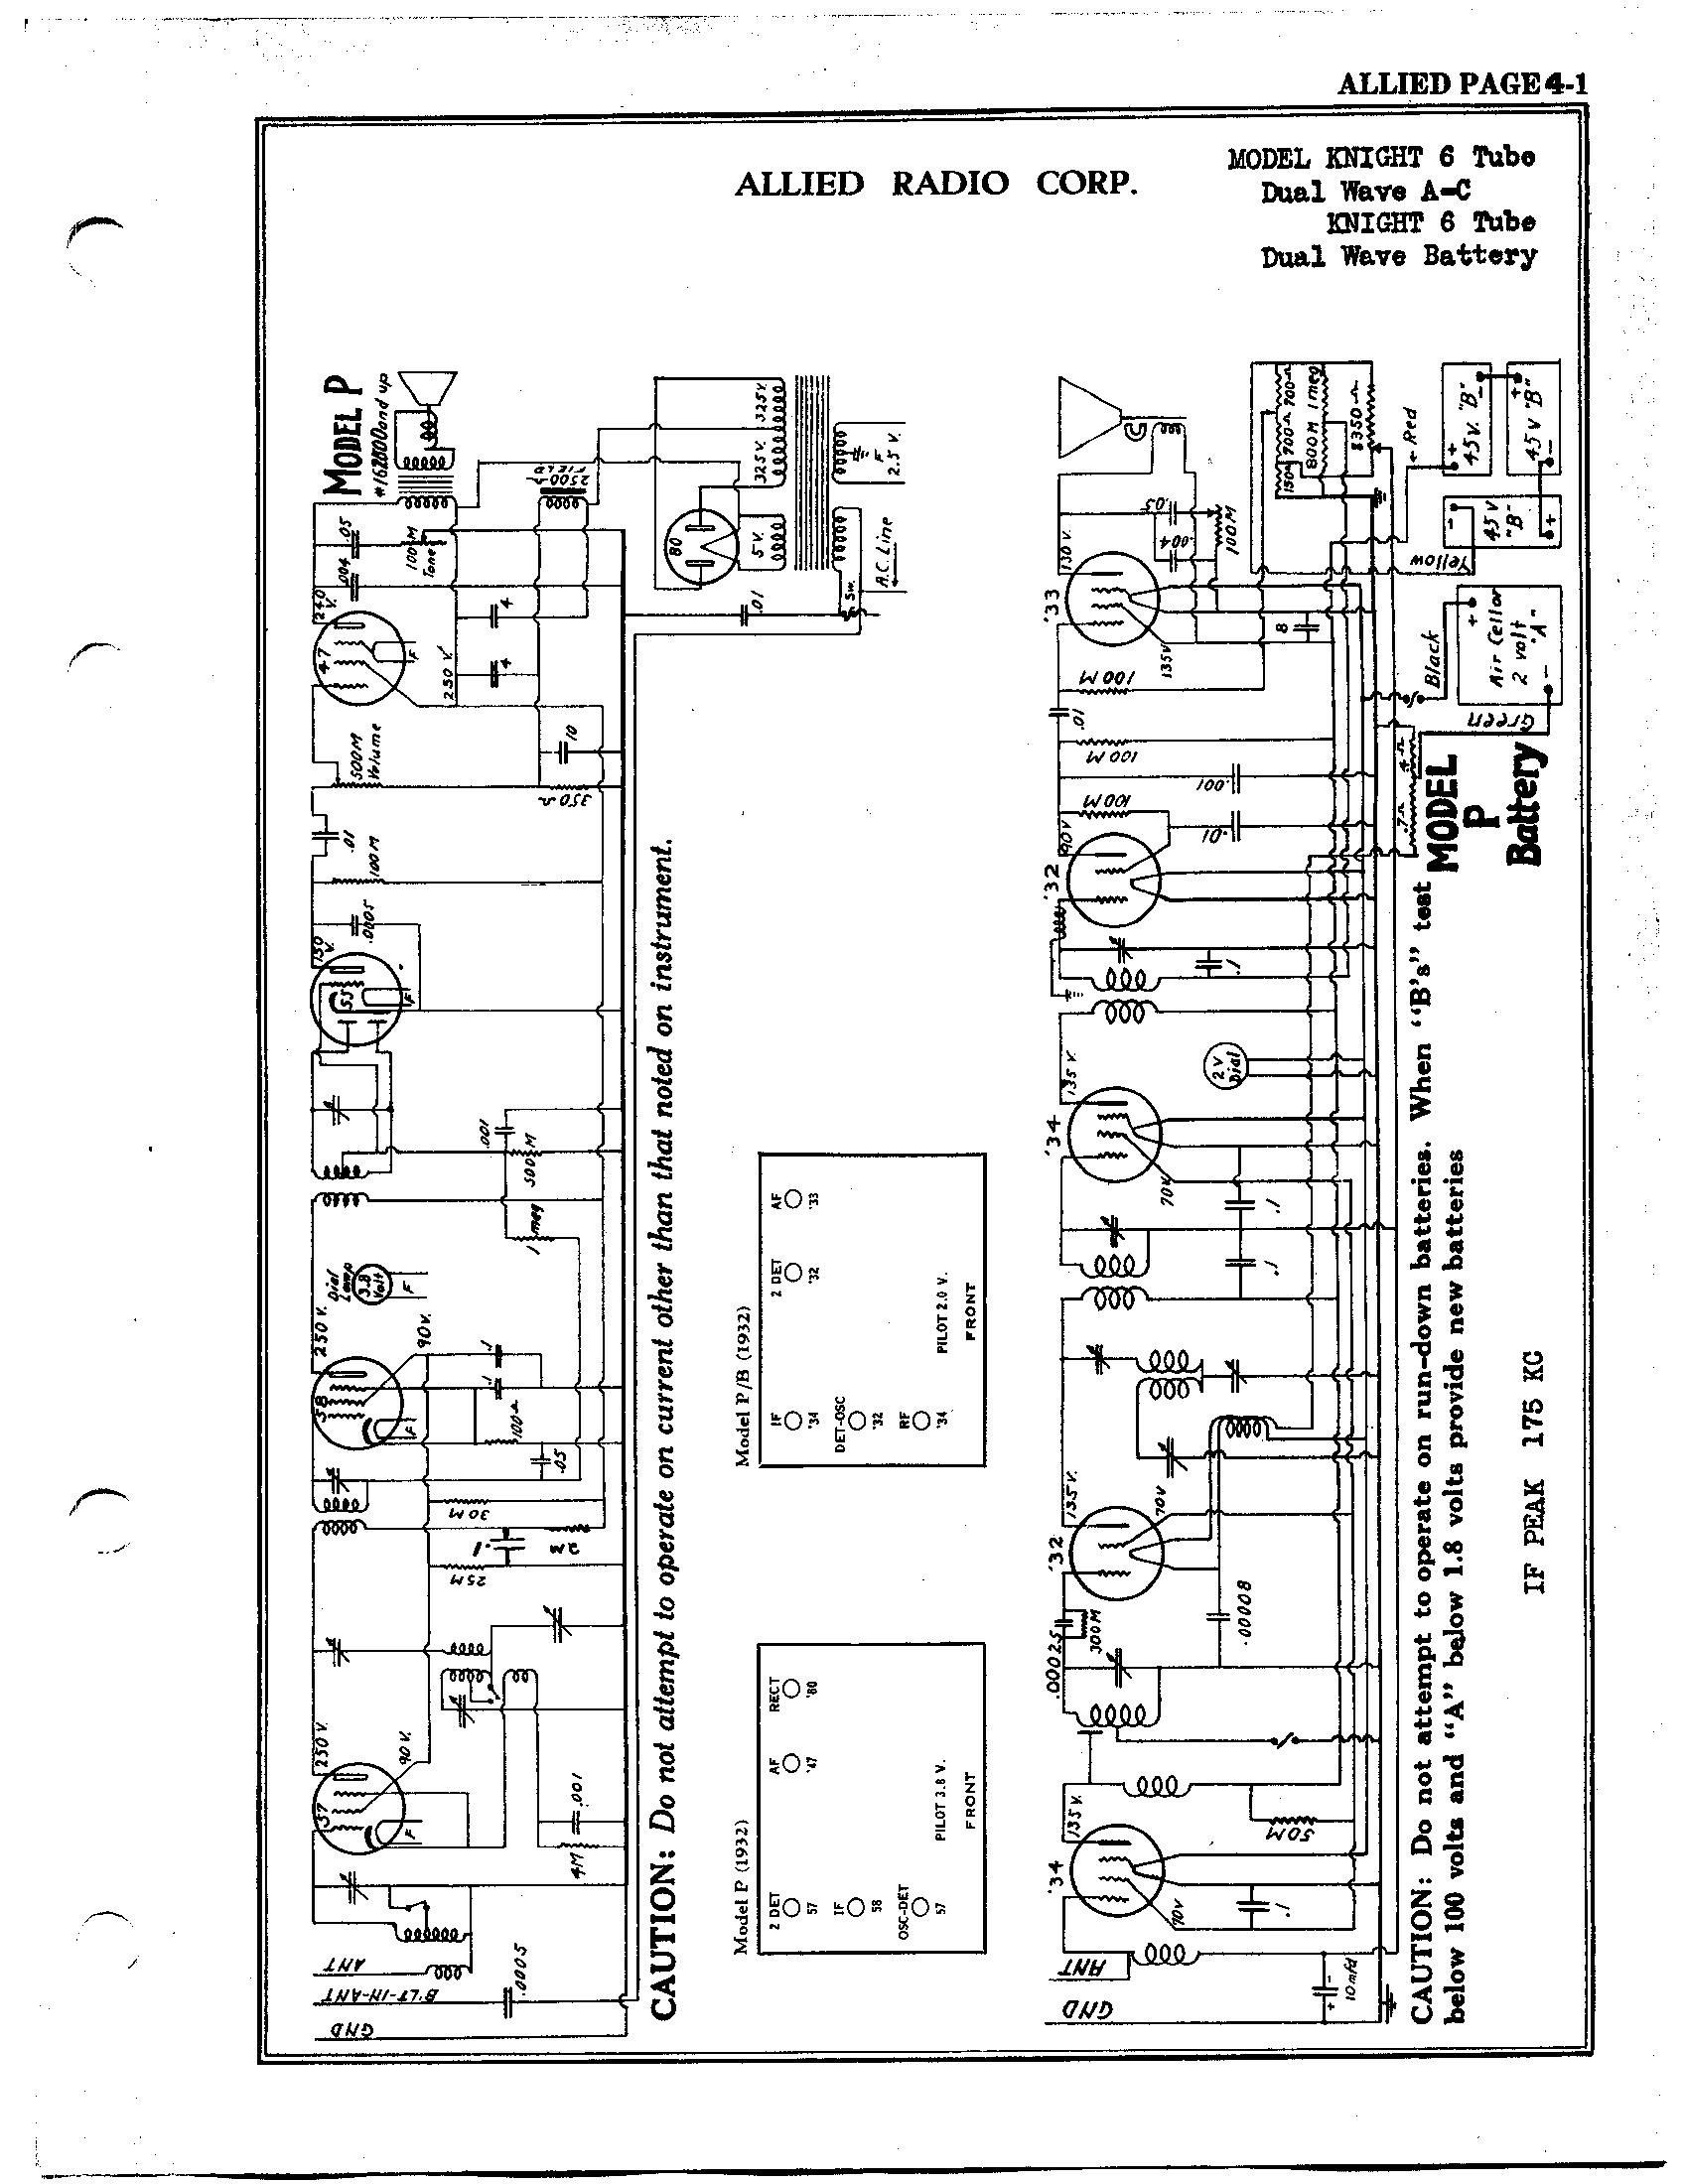 Allied Radio Corp Knight 6 Tube